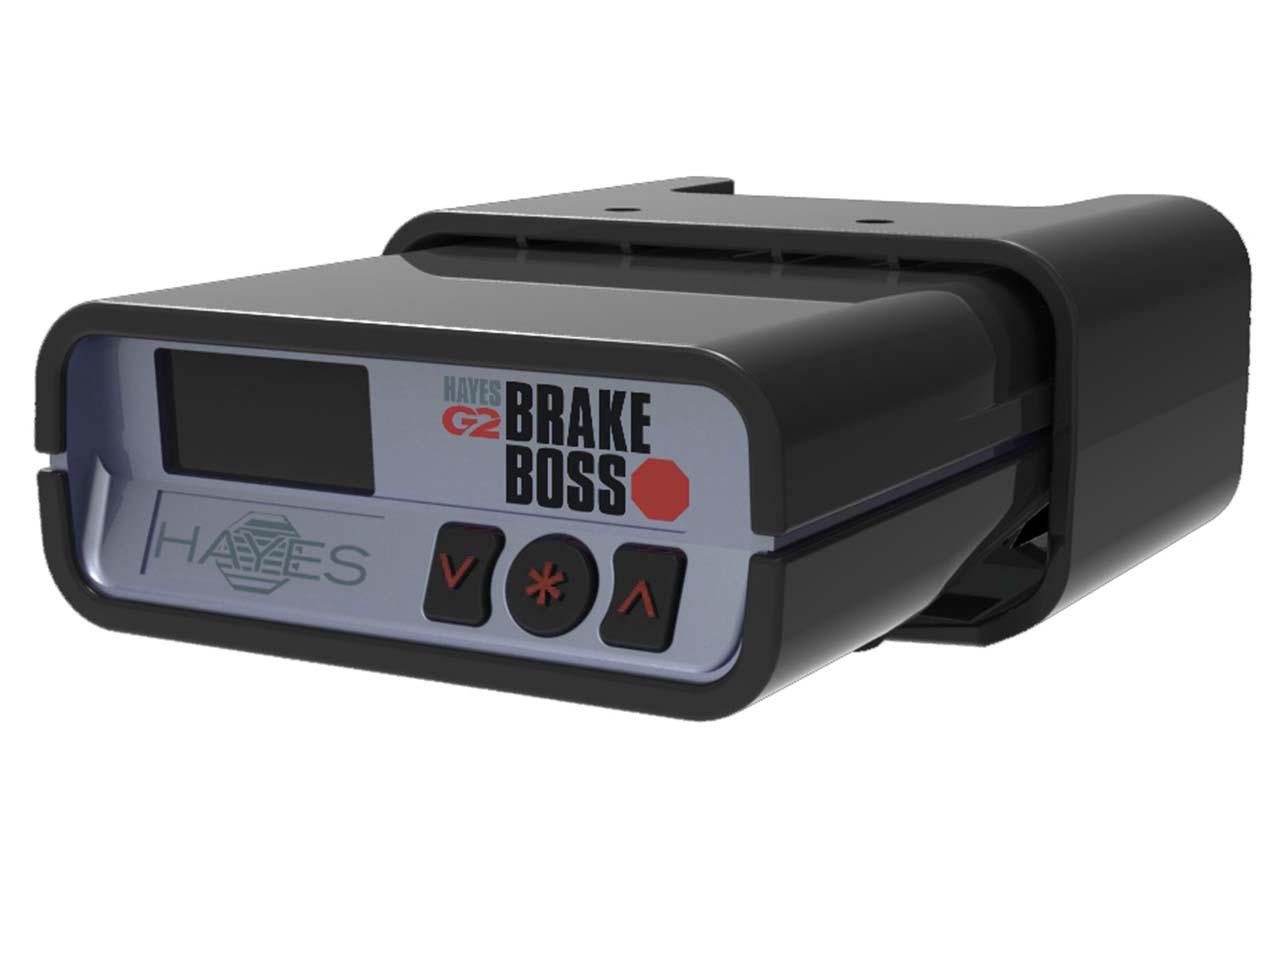 hayes brake controller wiring diagram 1000w hps ballast headlight for 2015 gmc 2500hd get free